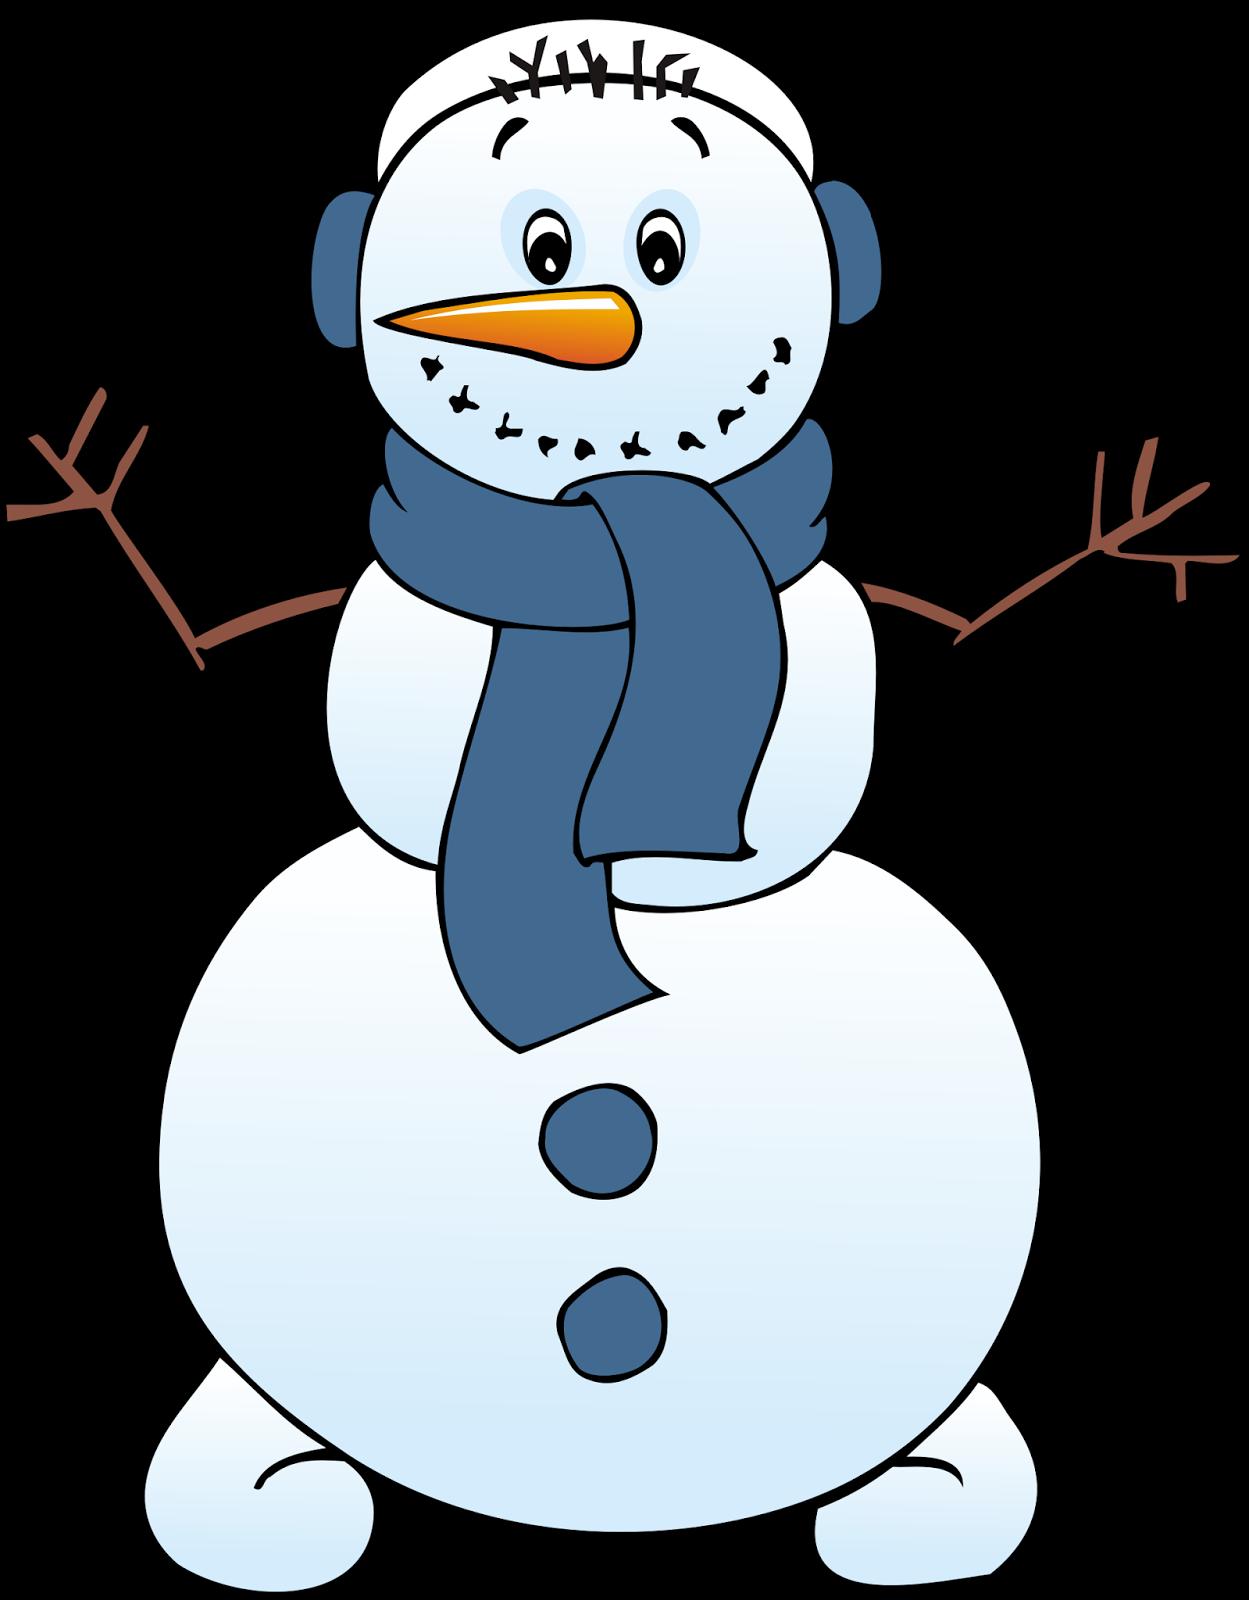 The kourt room december. Snowman clipart mouth